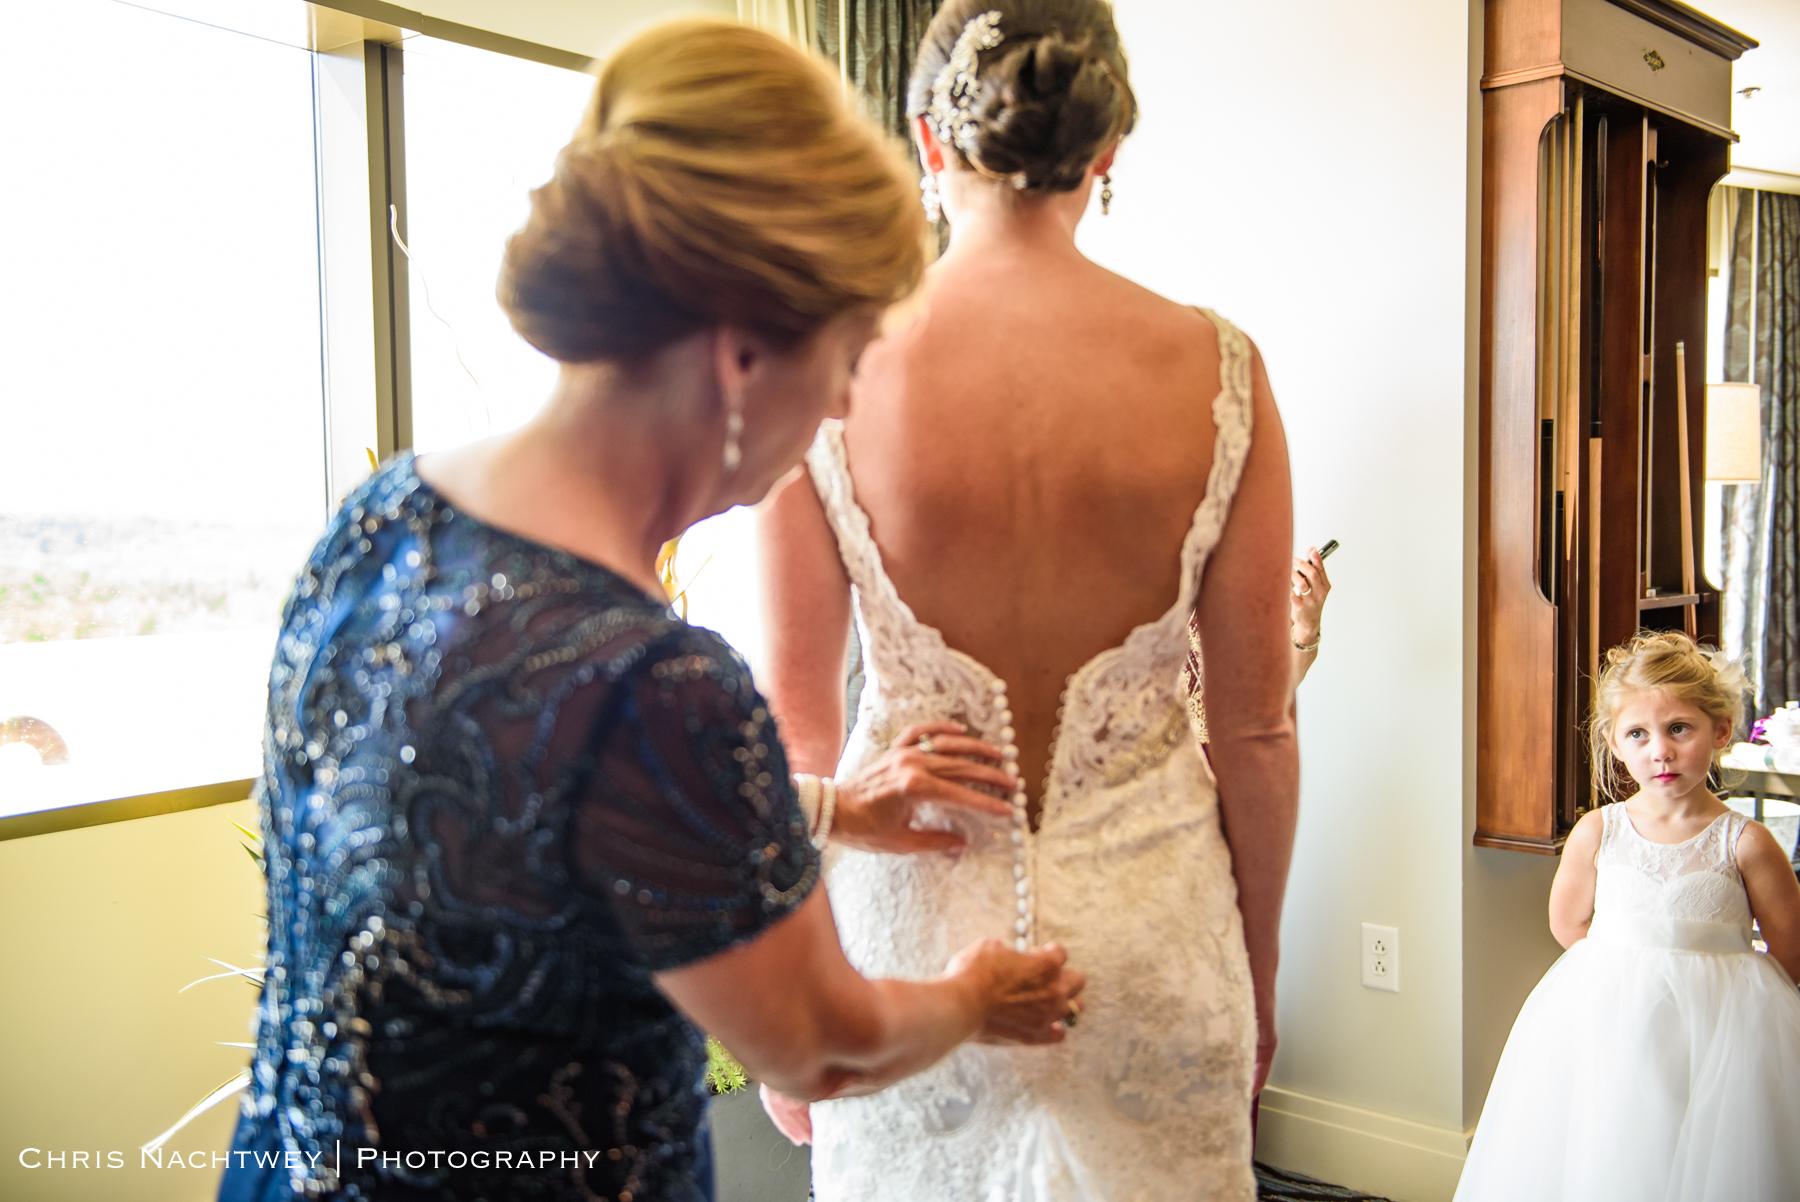 wedding-lake-of-isles-photos-chris-nachtwey-photography-2019-7.jpg